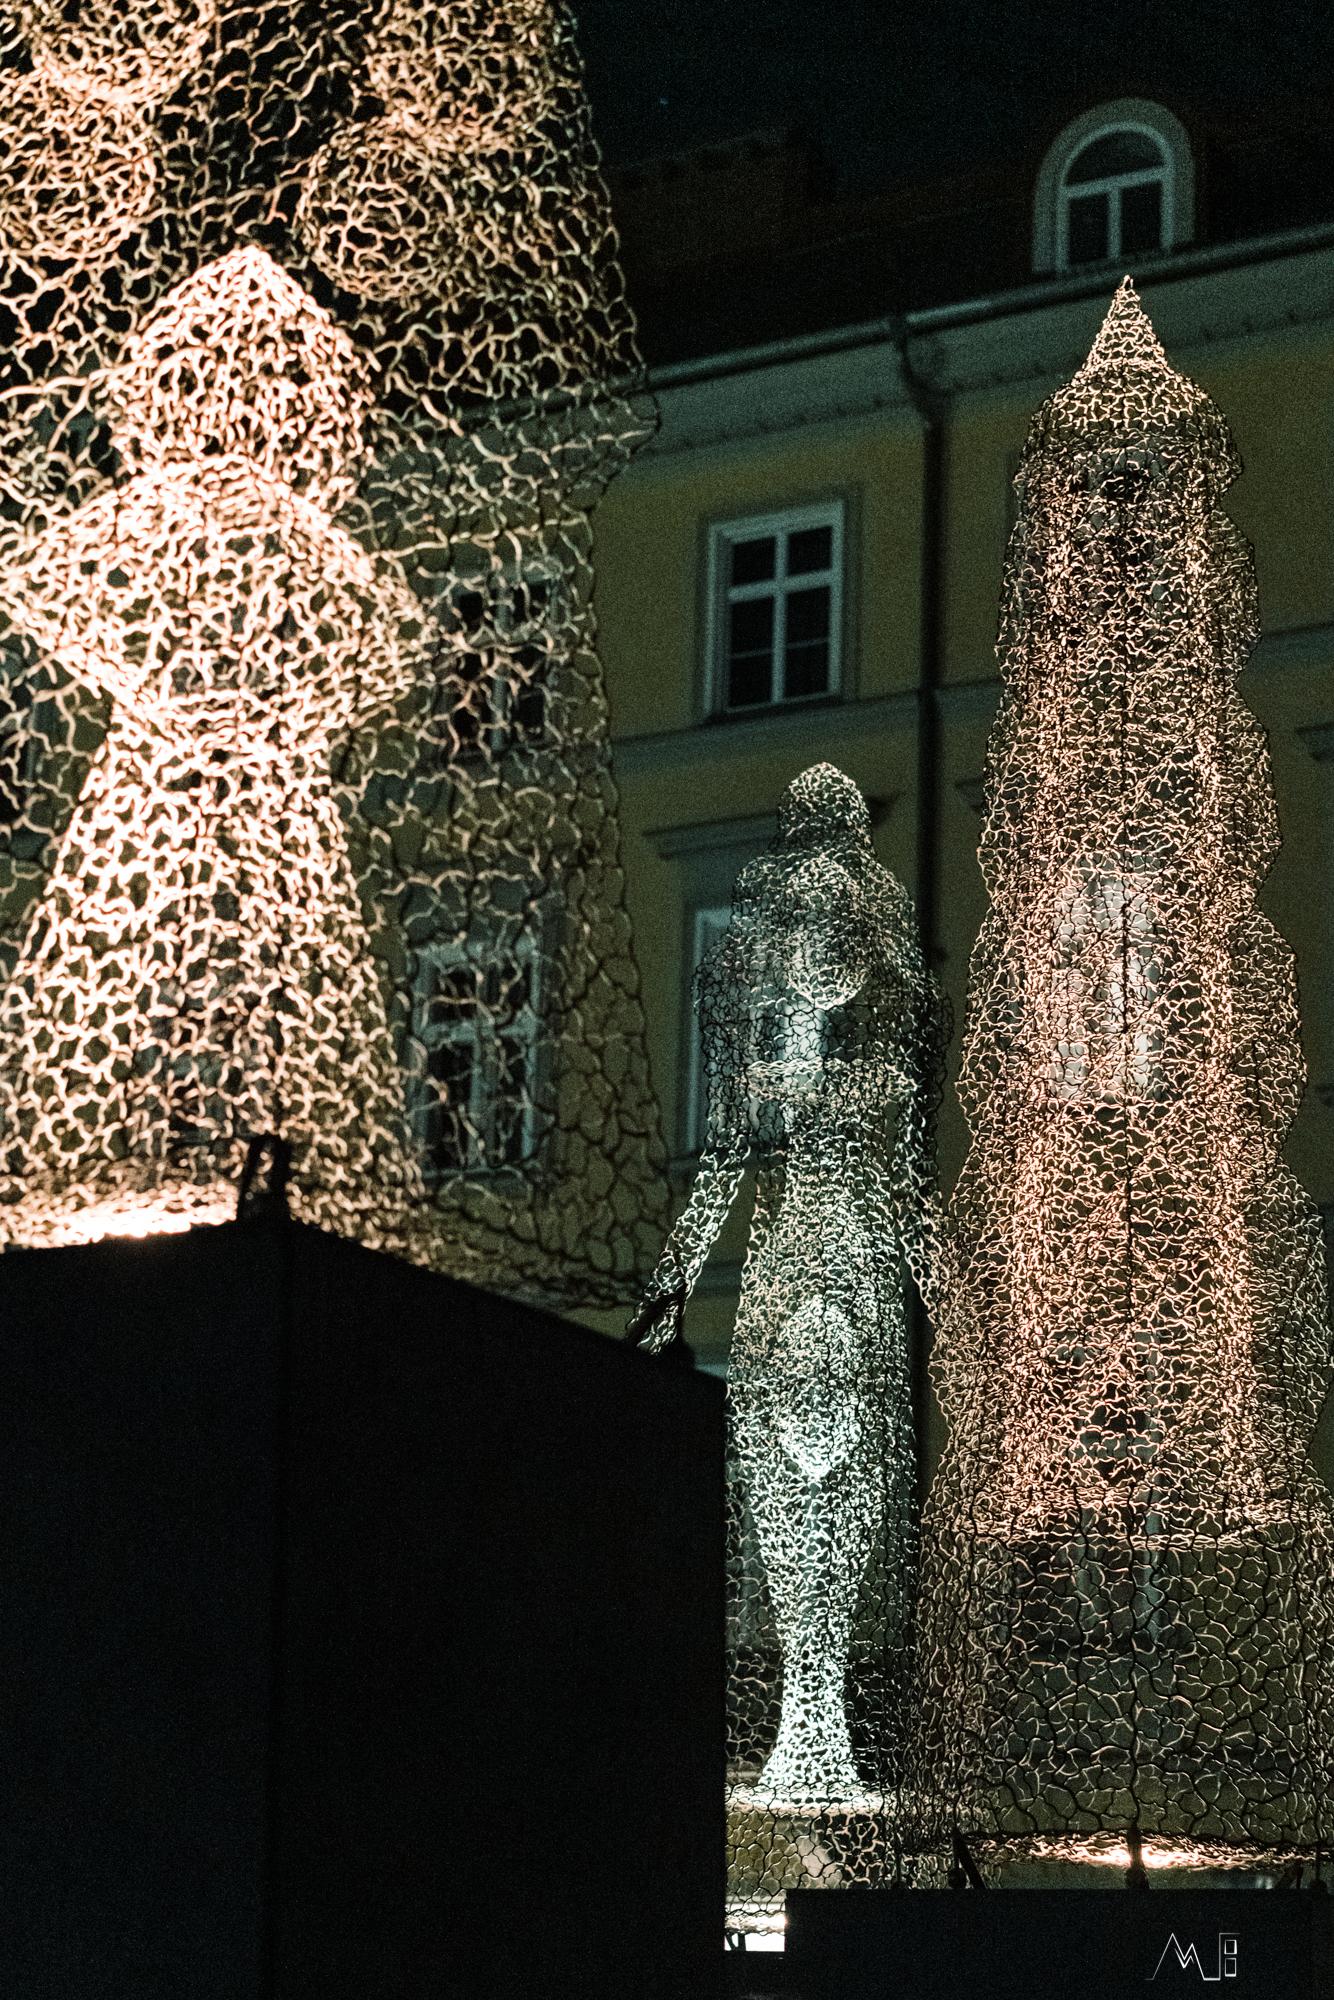 Klanglicht-2019-4773.jpg